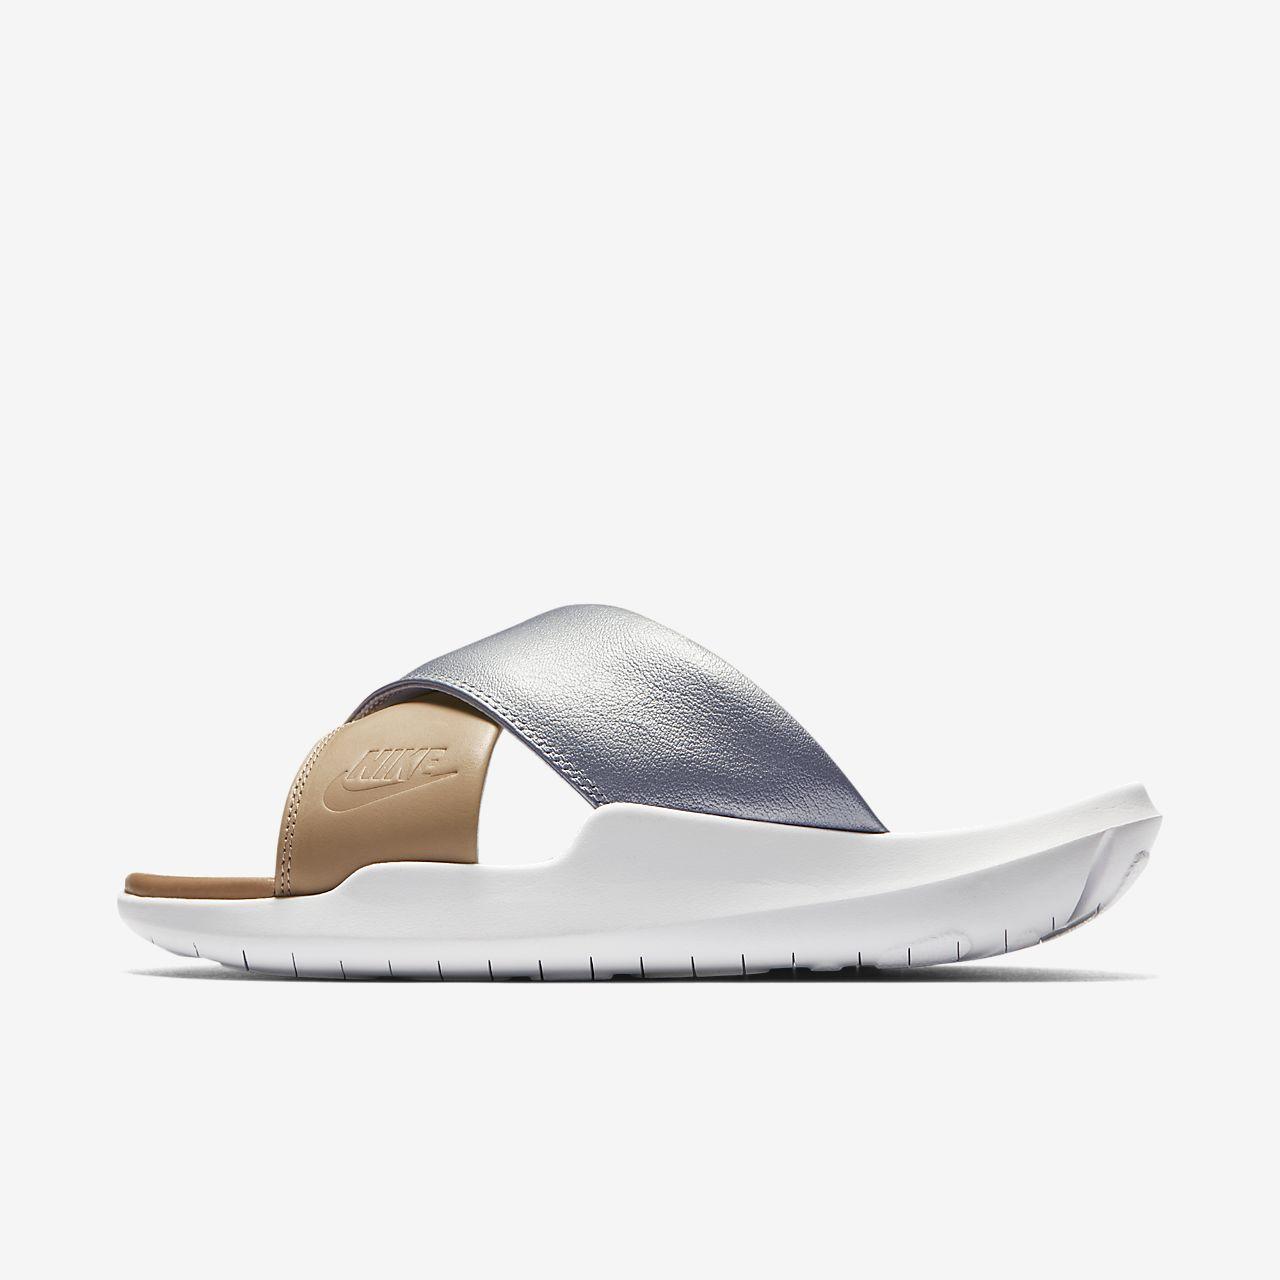 Nike Benassi Future Cross SE Premium Damen-Badeslipper - Silver irpF9VvLt